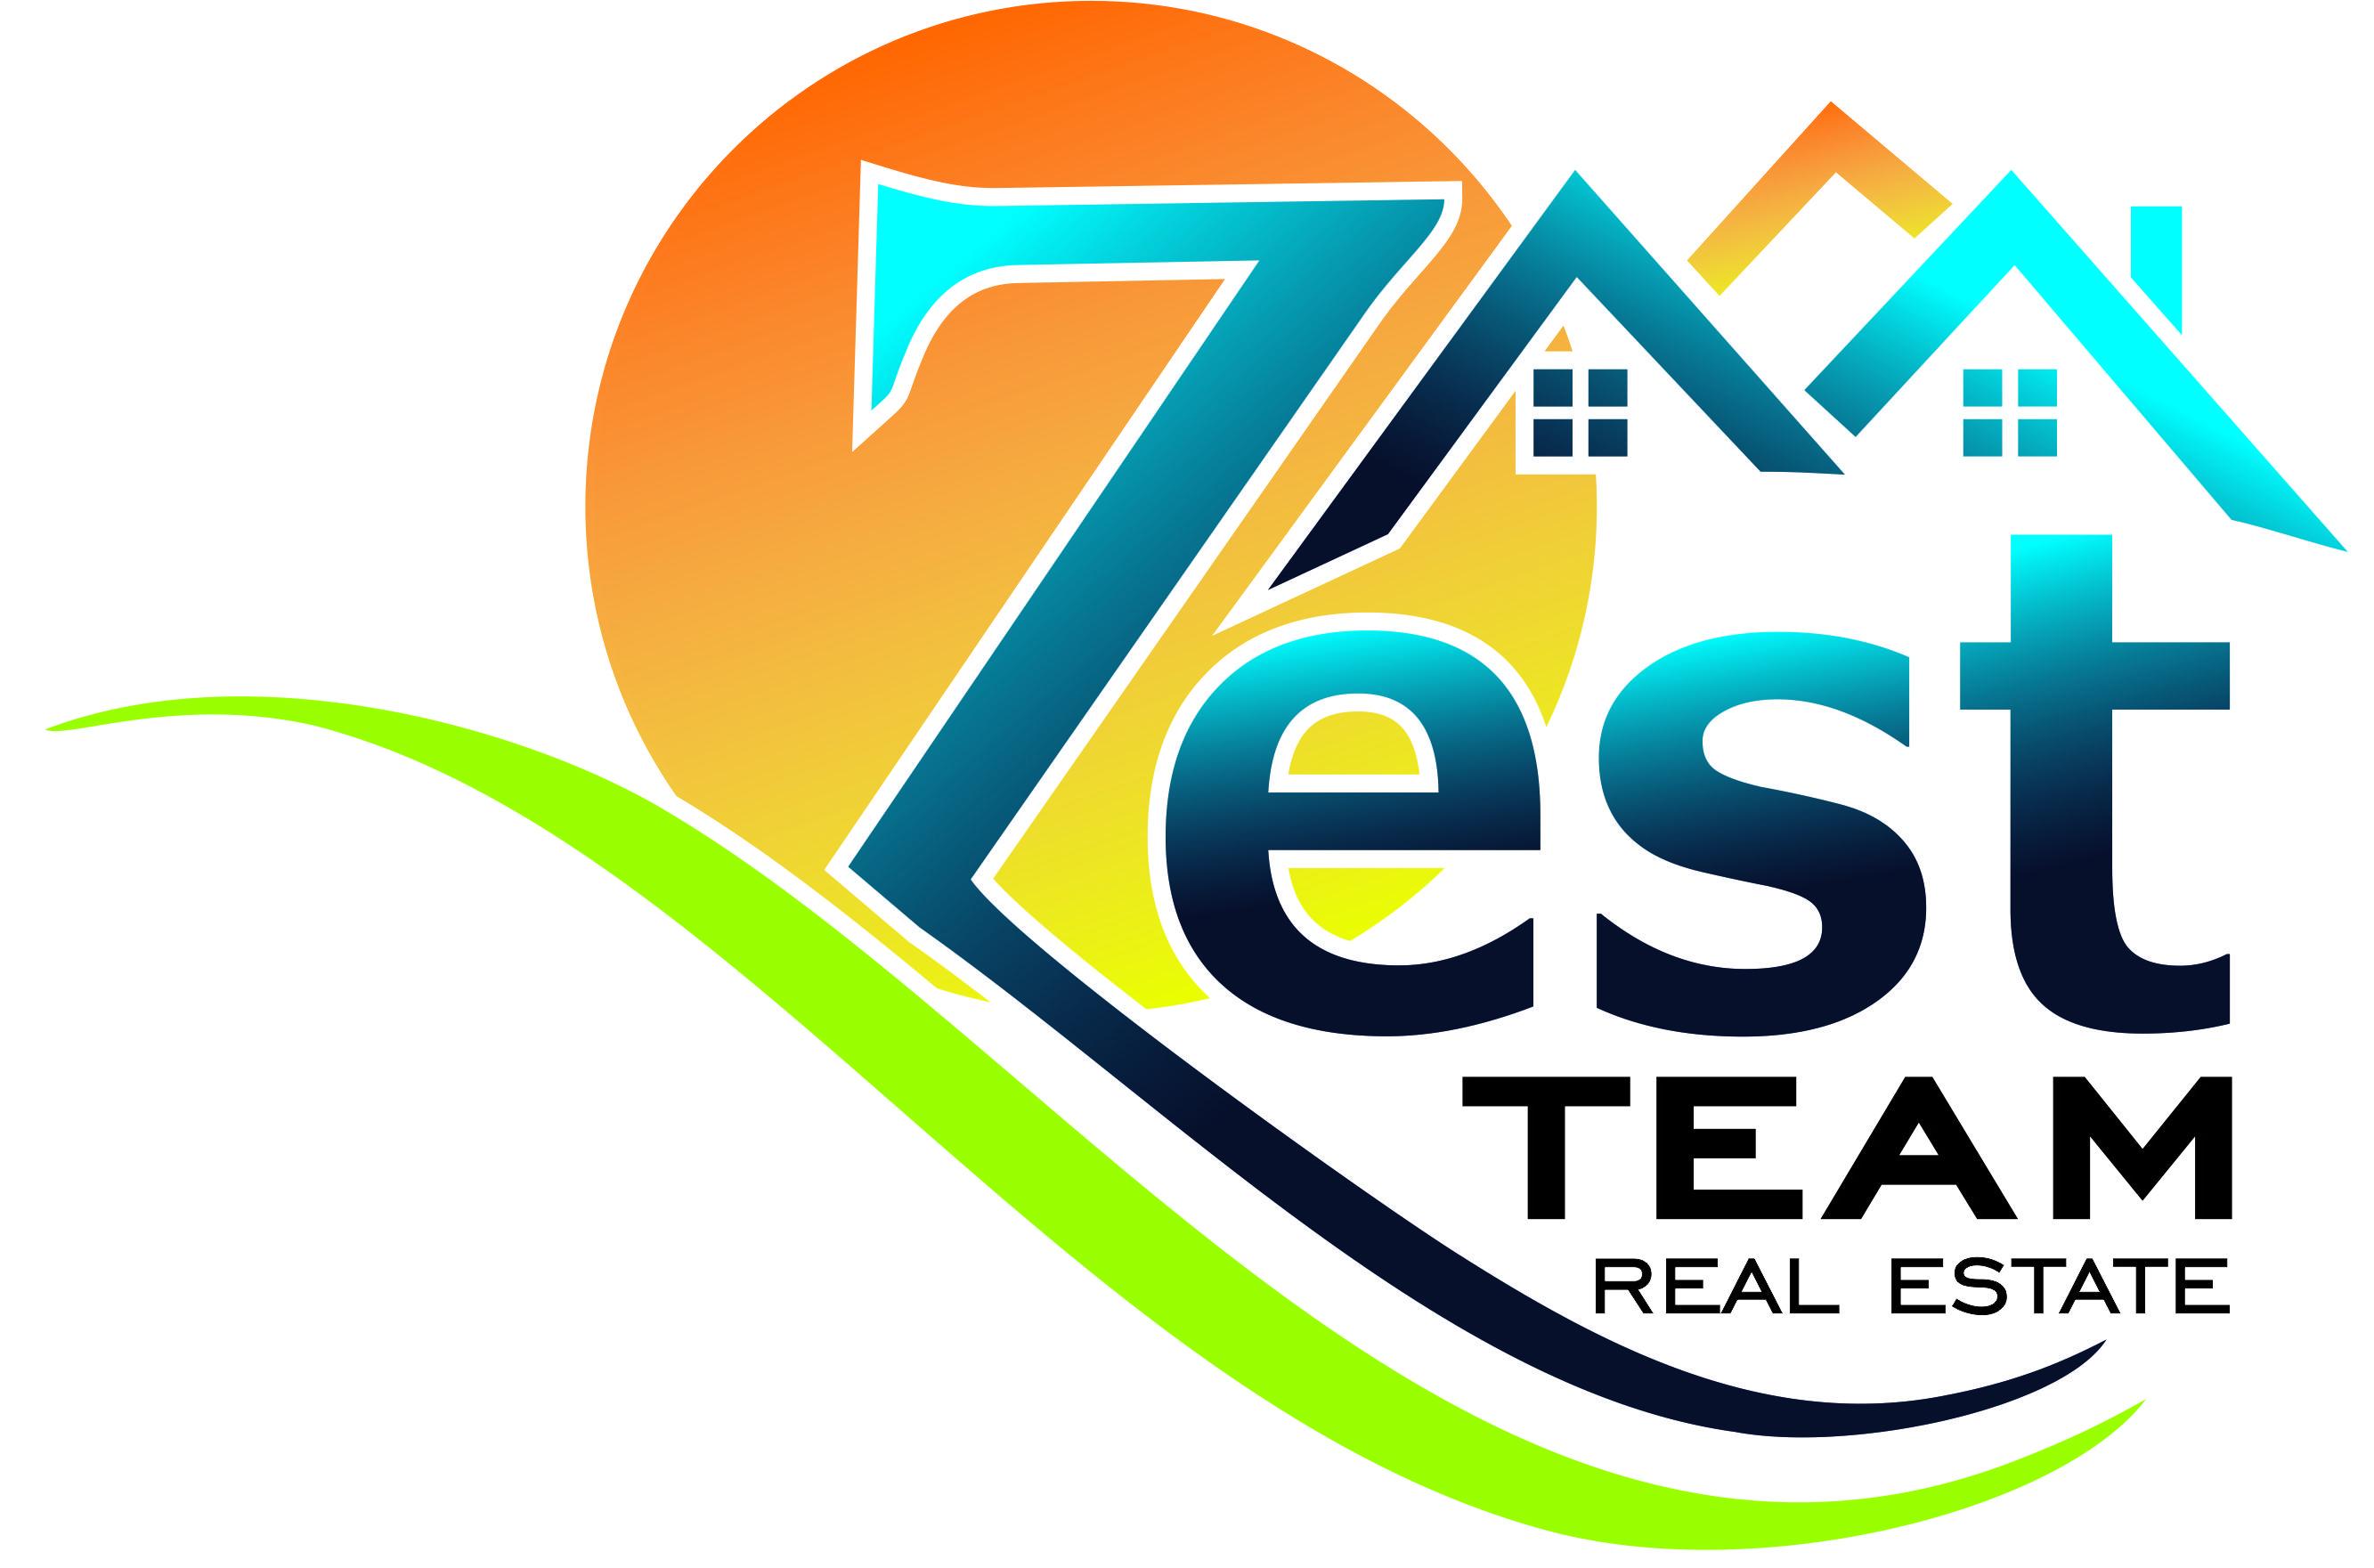 Zest Team At Future Home Realty | Tampa Florida Real Estate | Tampa Florida Realtor | New Homes for Sale | Tampa Florida